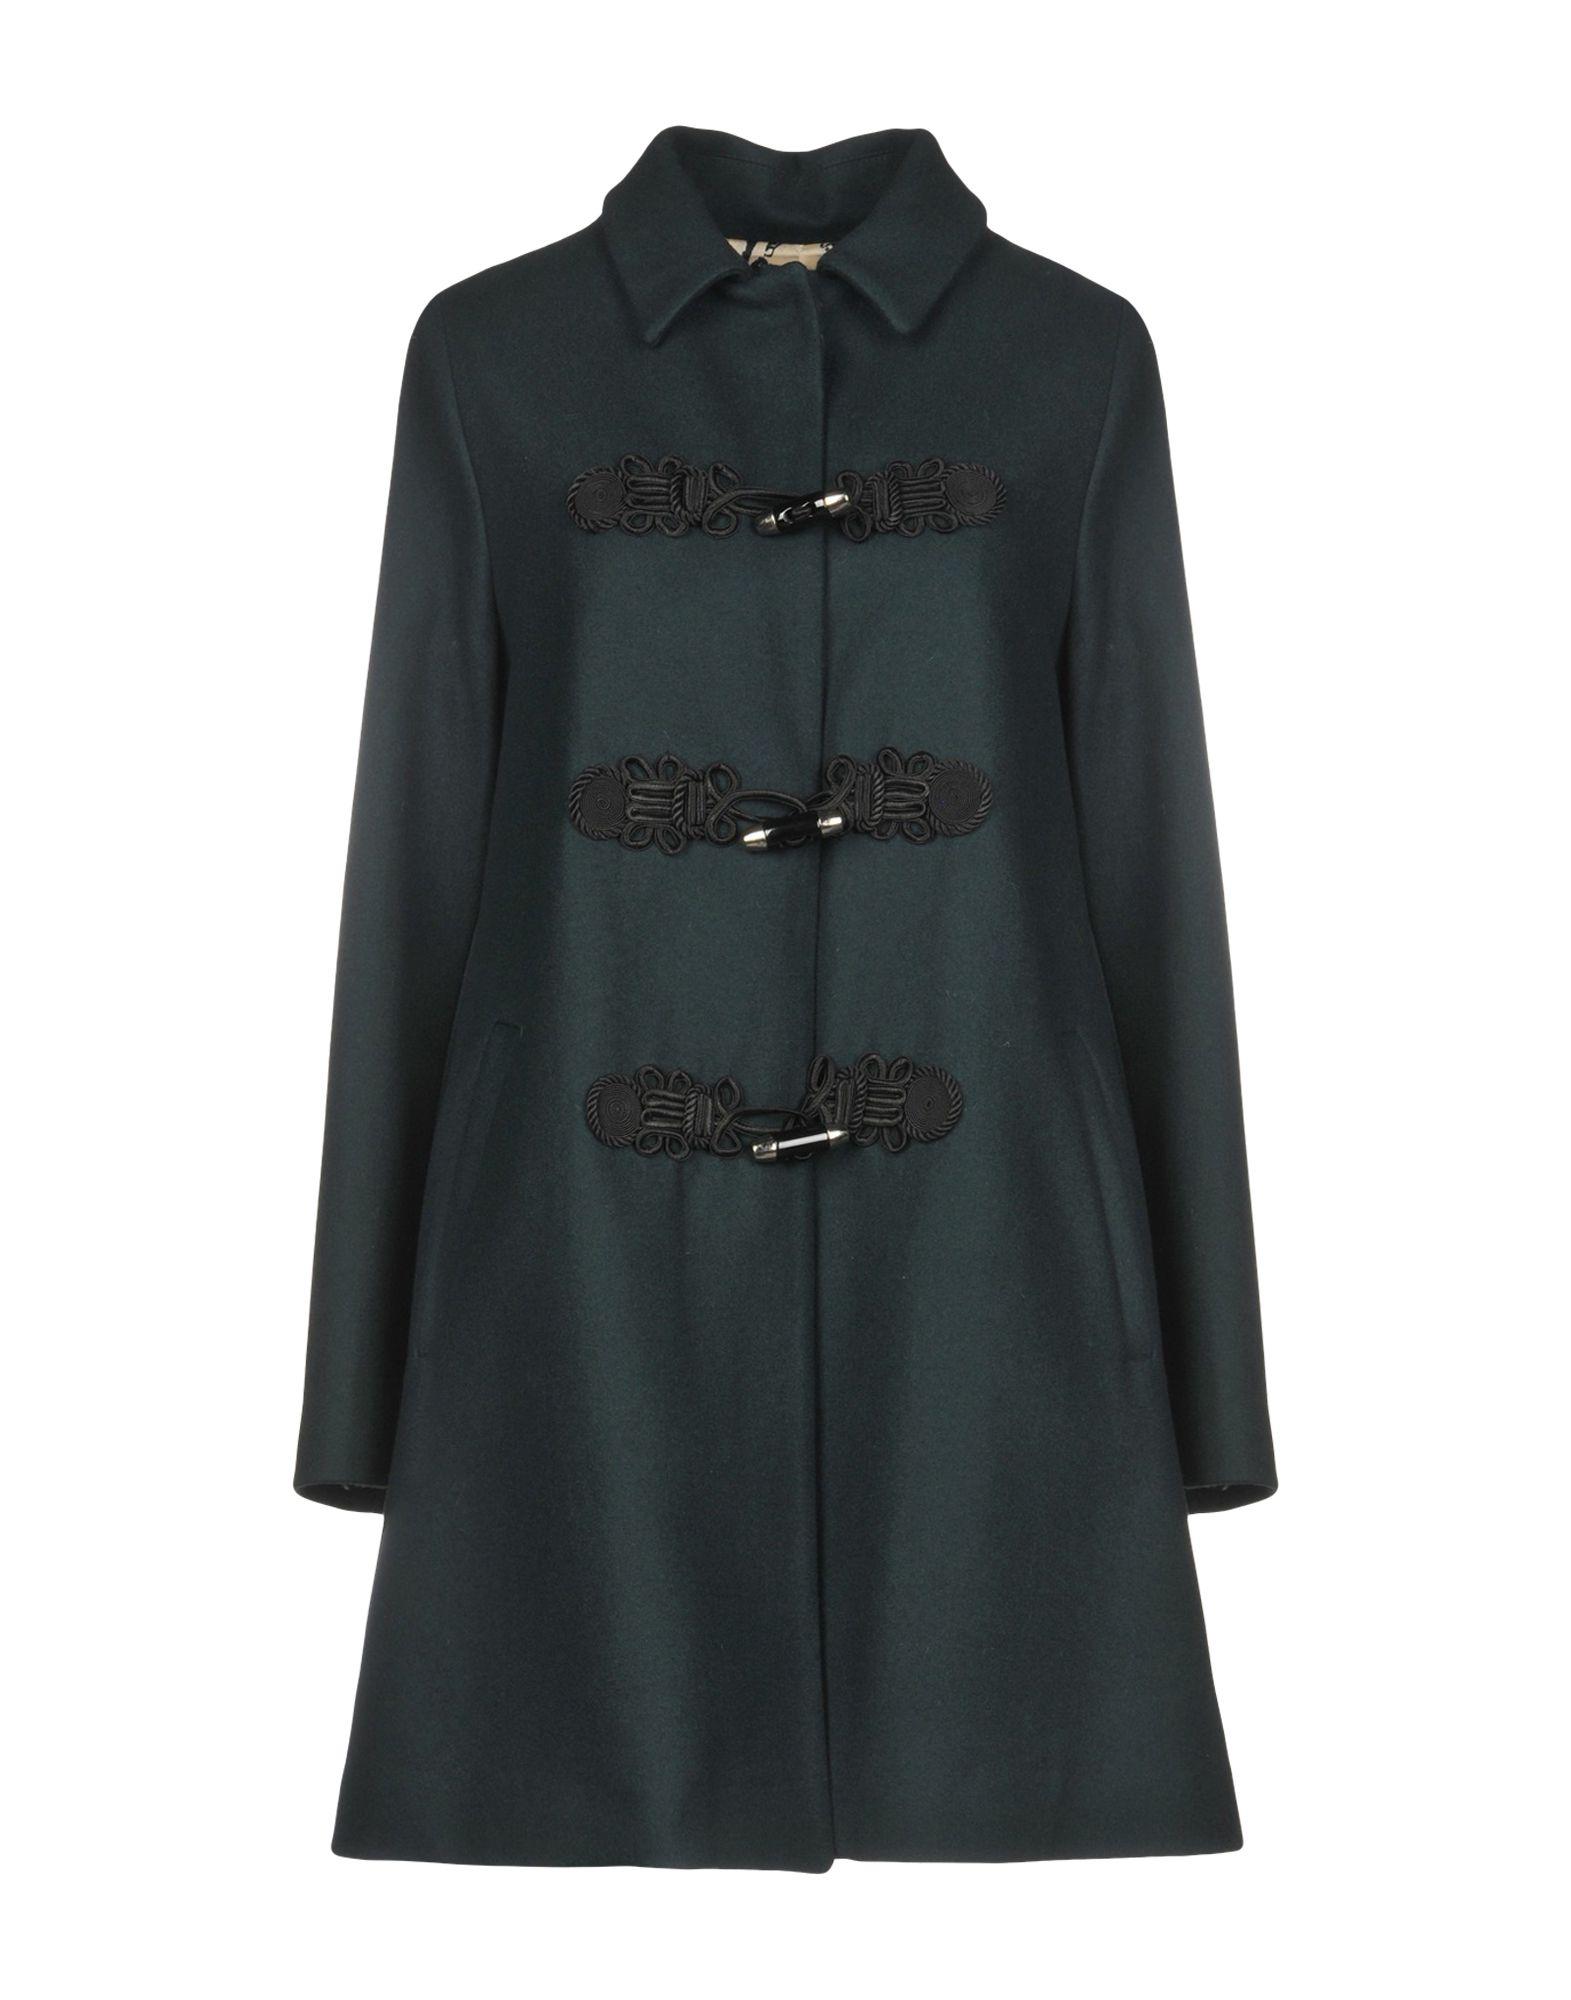 OFF Coat in Dark Green